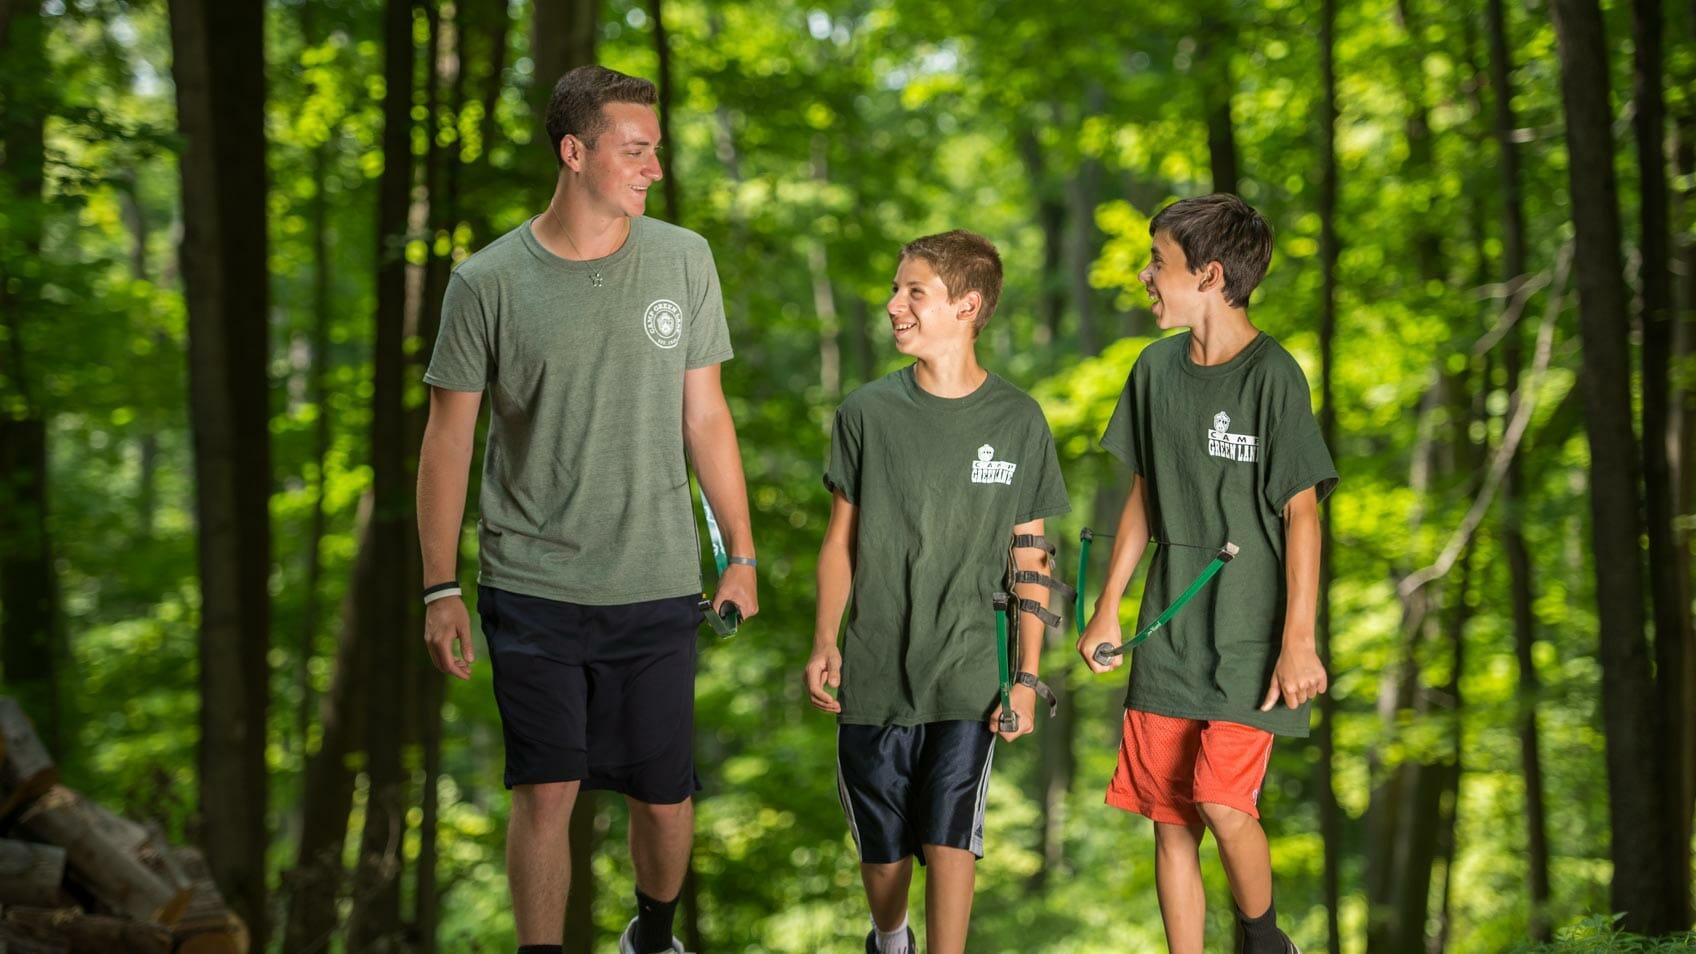 staff-campers-path-walk